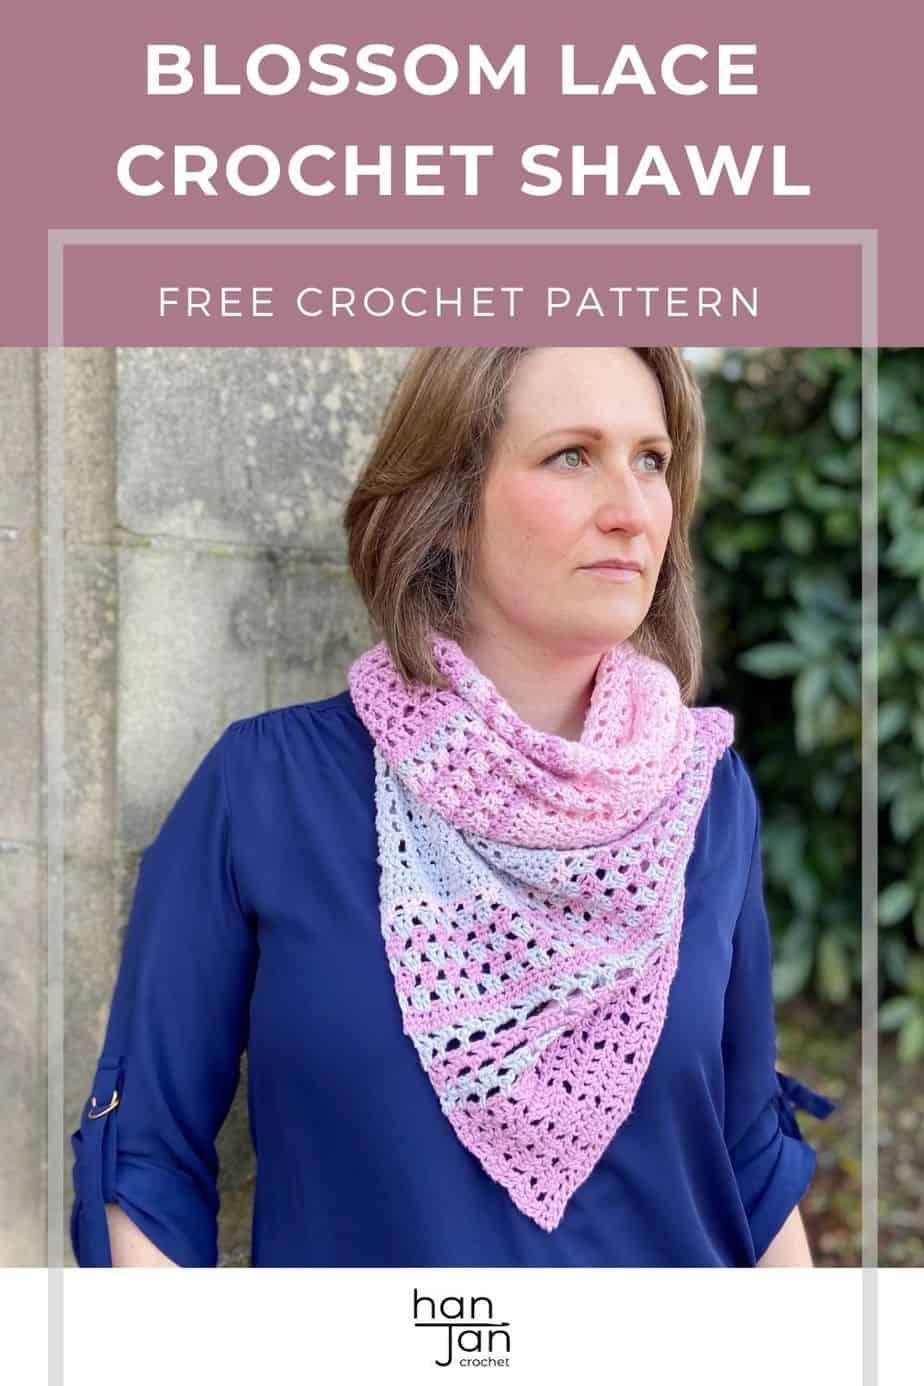 Blossom Lace Crochet Shawl Pattern Furls Crochet CAL 2021 pin 1